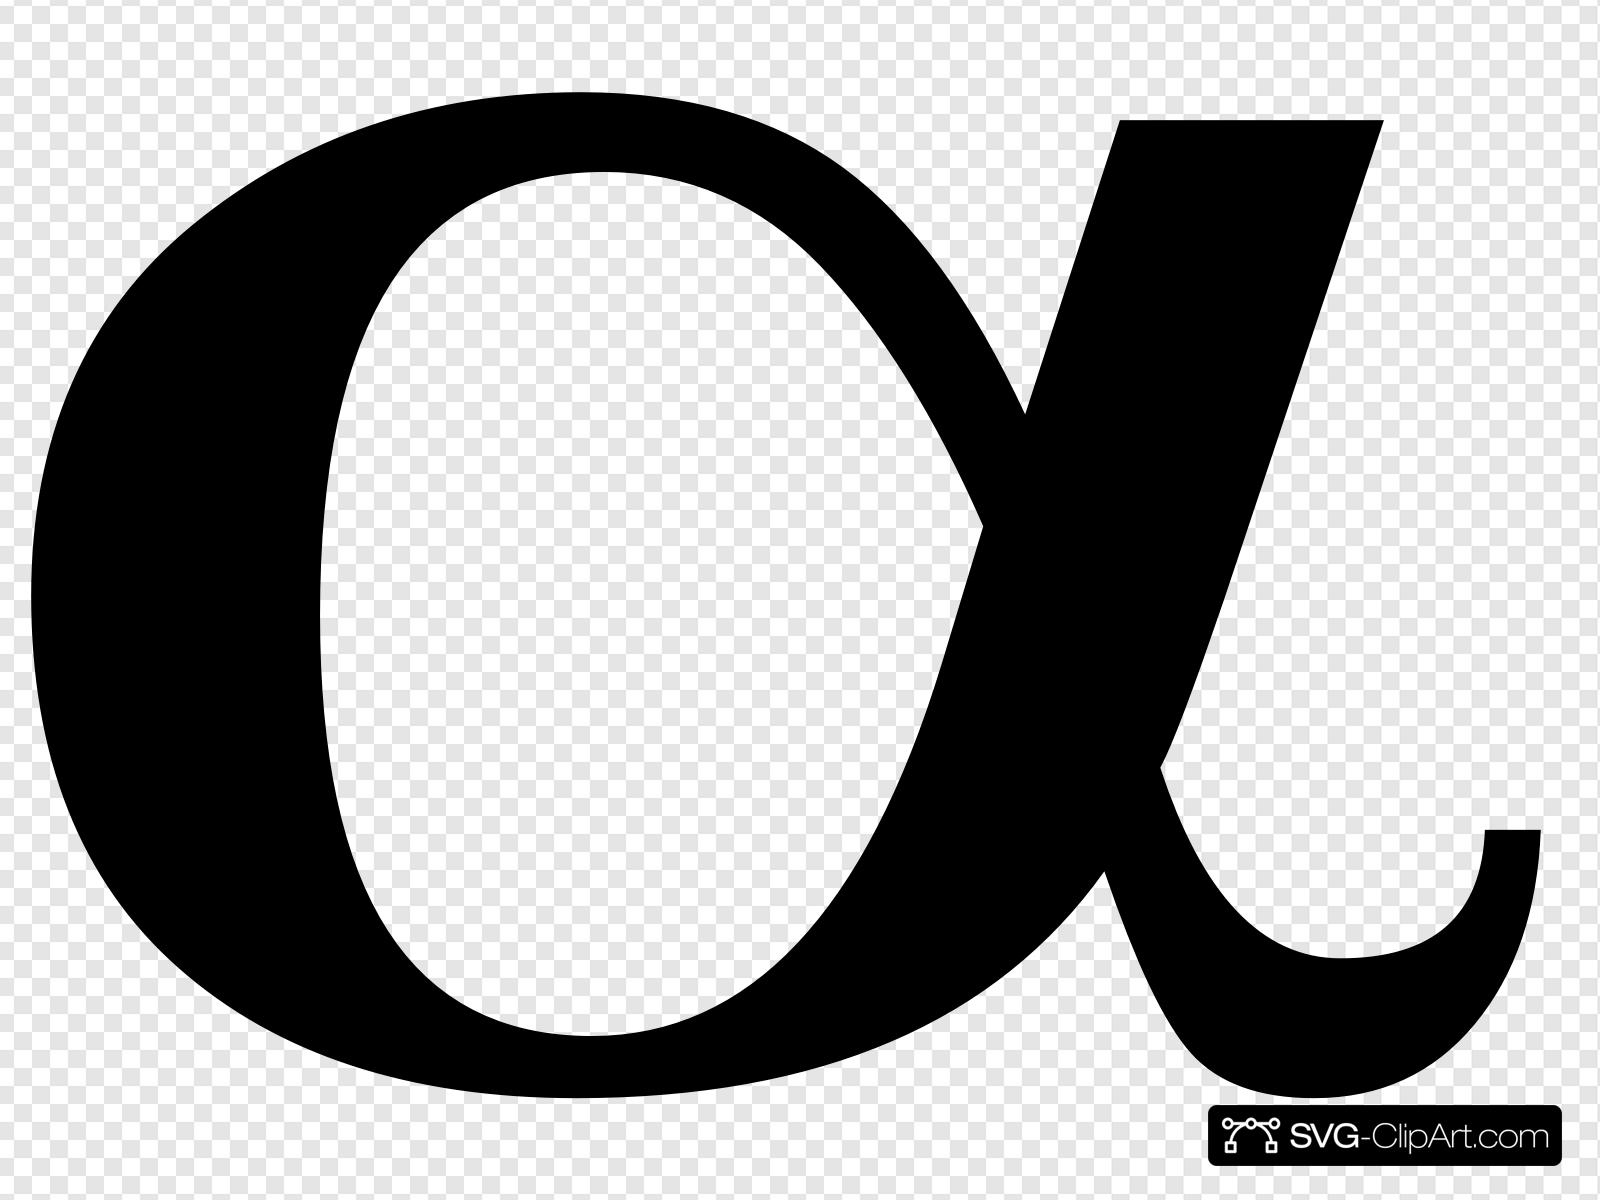 Alpha Clip art, Icon and SVG.